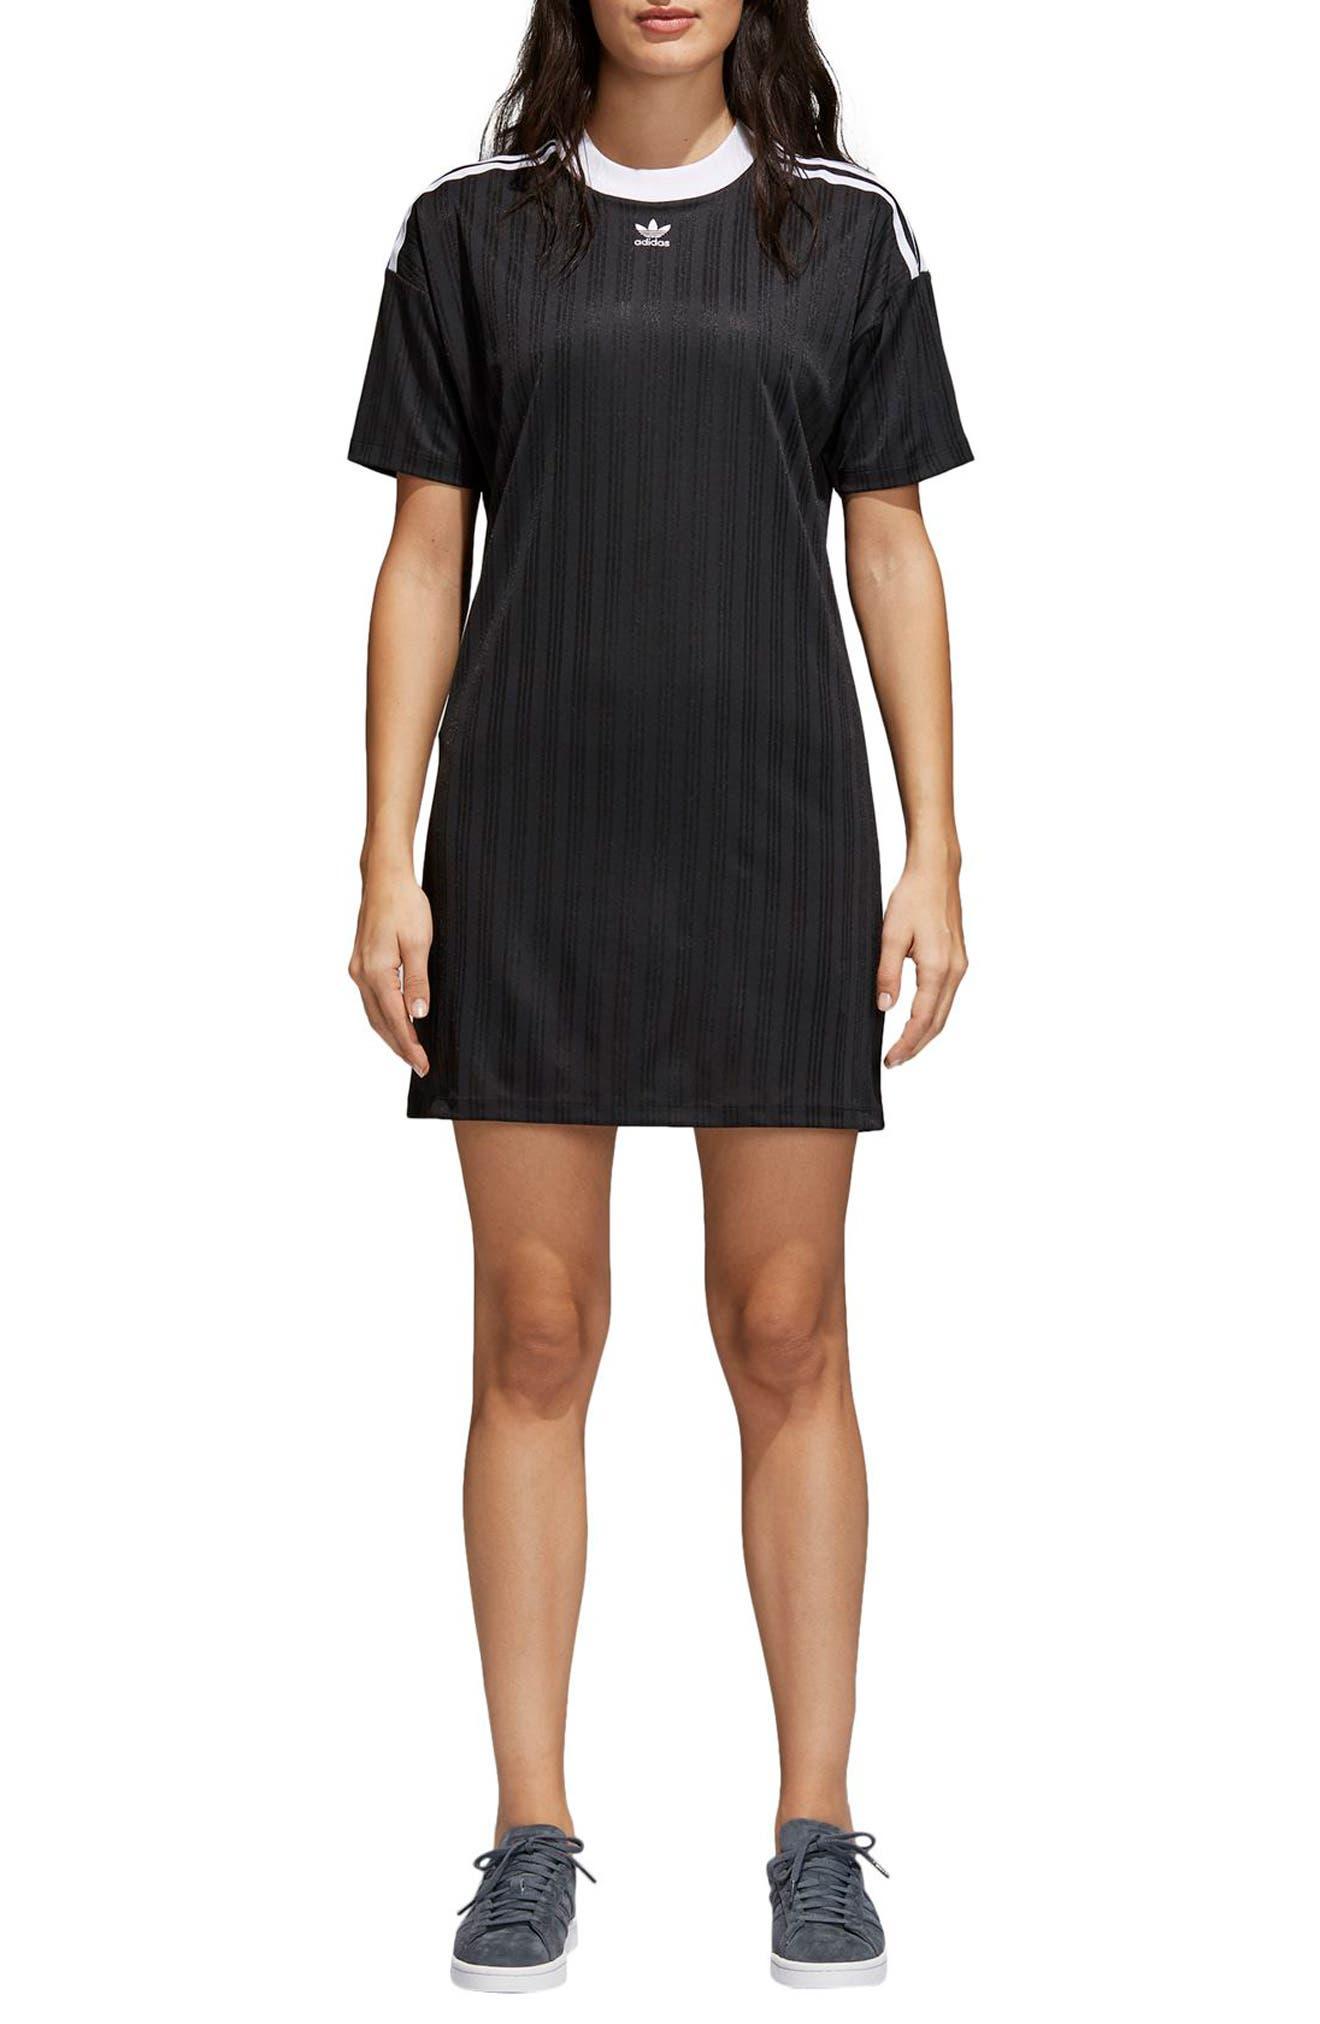 ADIDAS ORIGINALS,                             Trefoil T-Shirt Dress,                             Alternate thumbnail 6, color,                             001